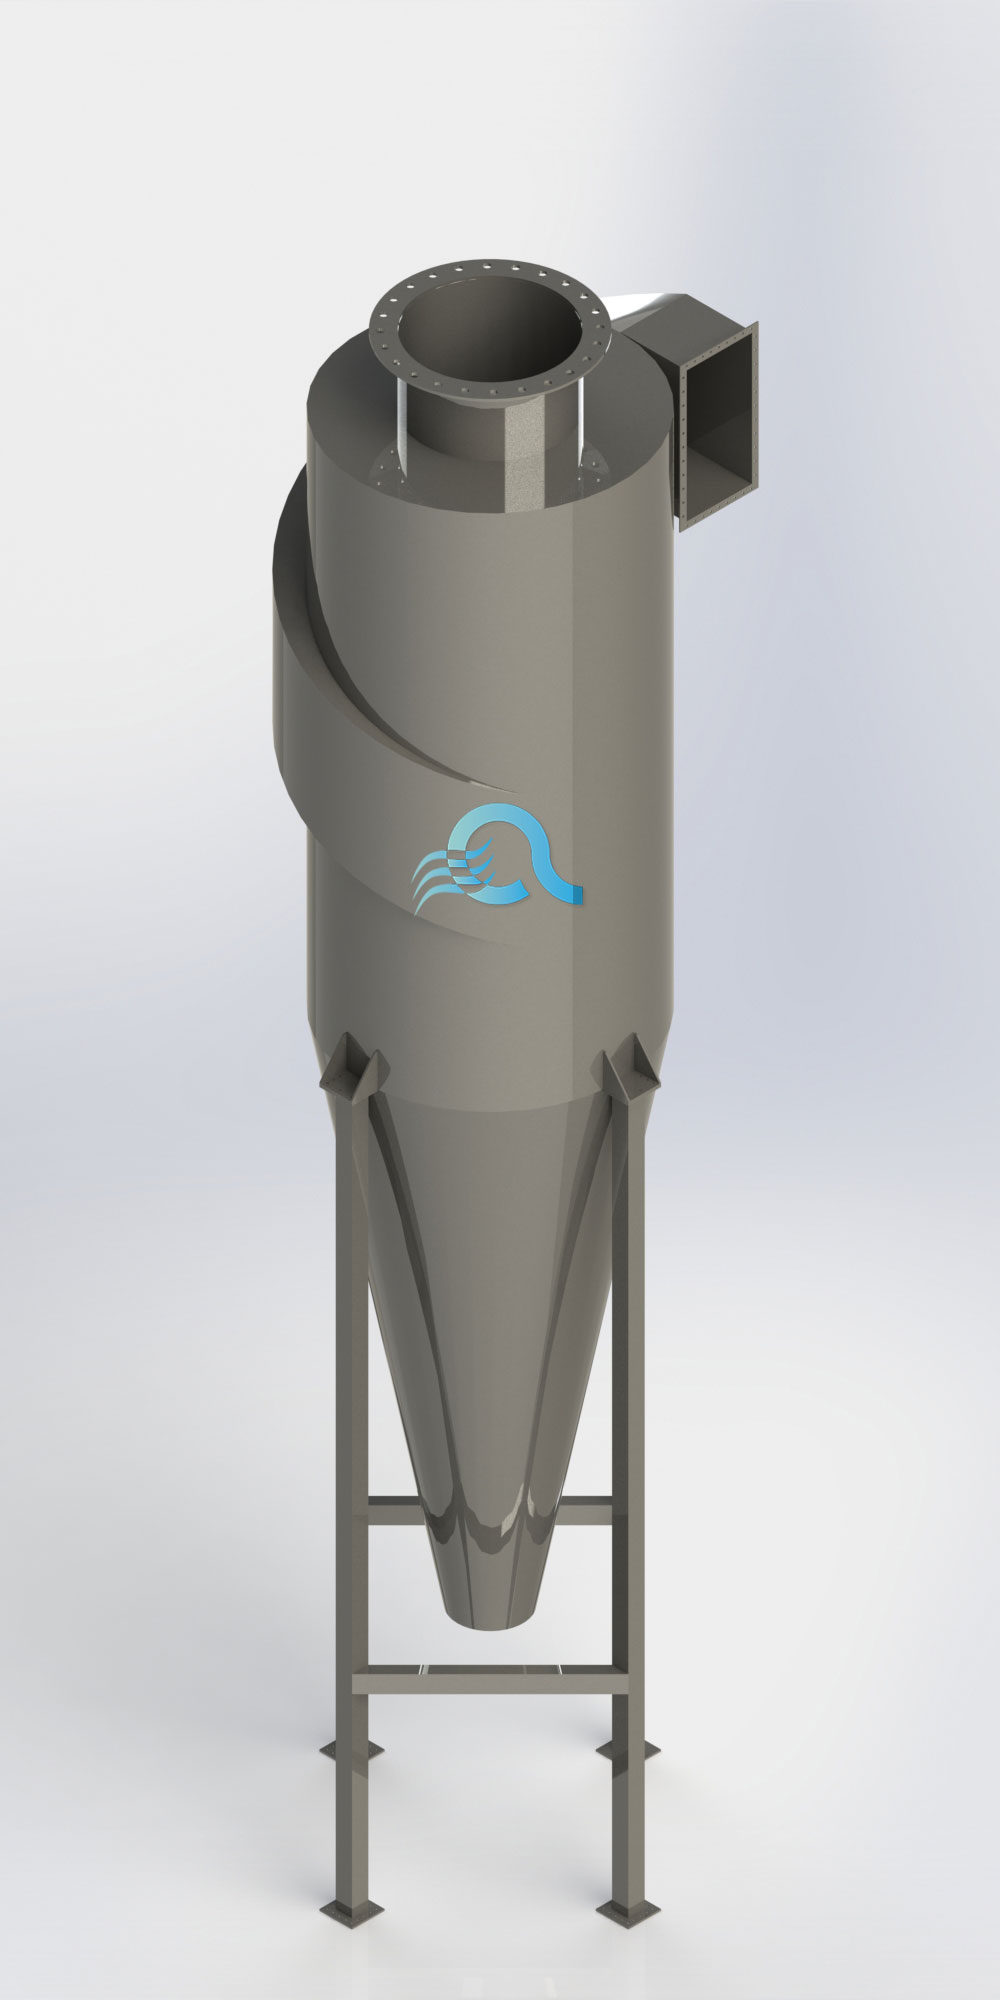 Cyclones - Industrial Air Treatment